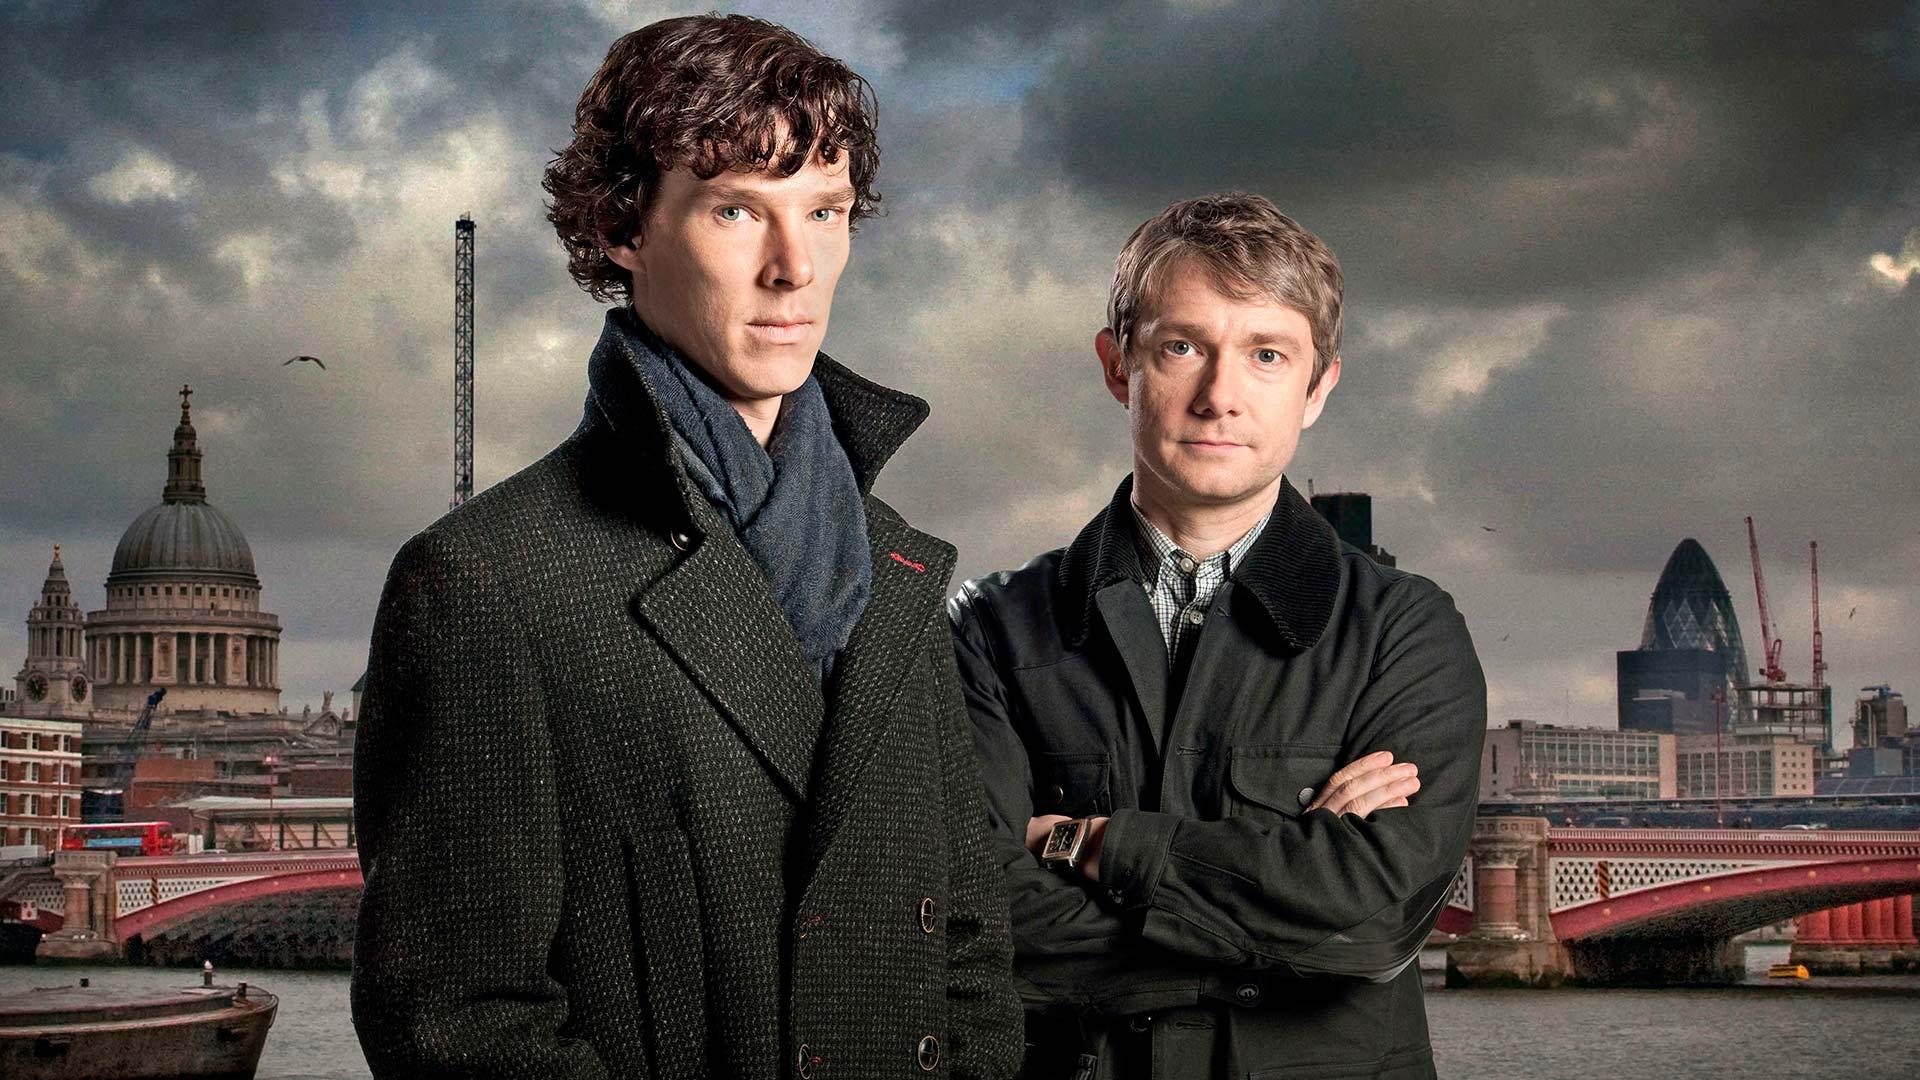 The modern adaptation of Sherlock Holmes from BBC America